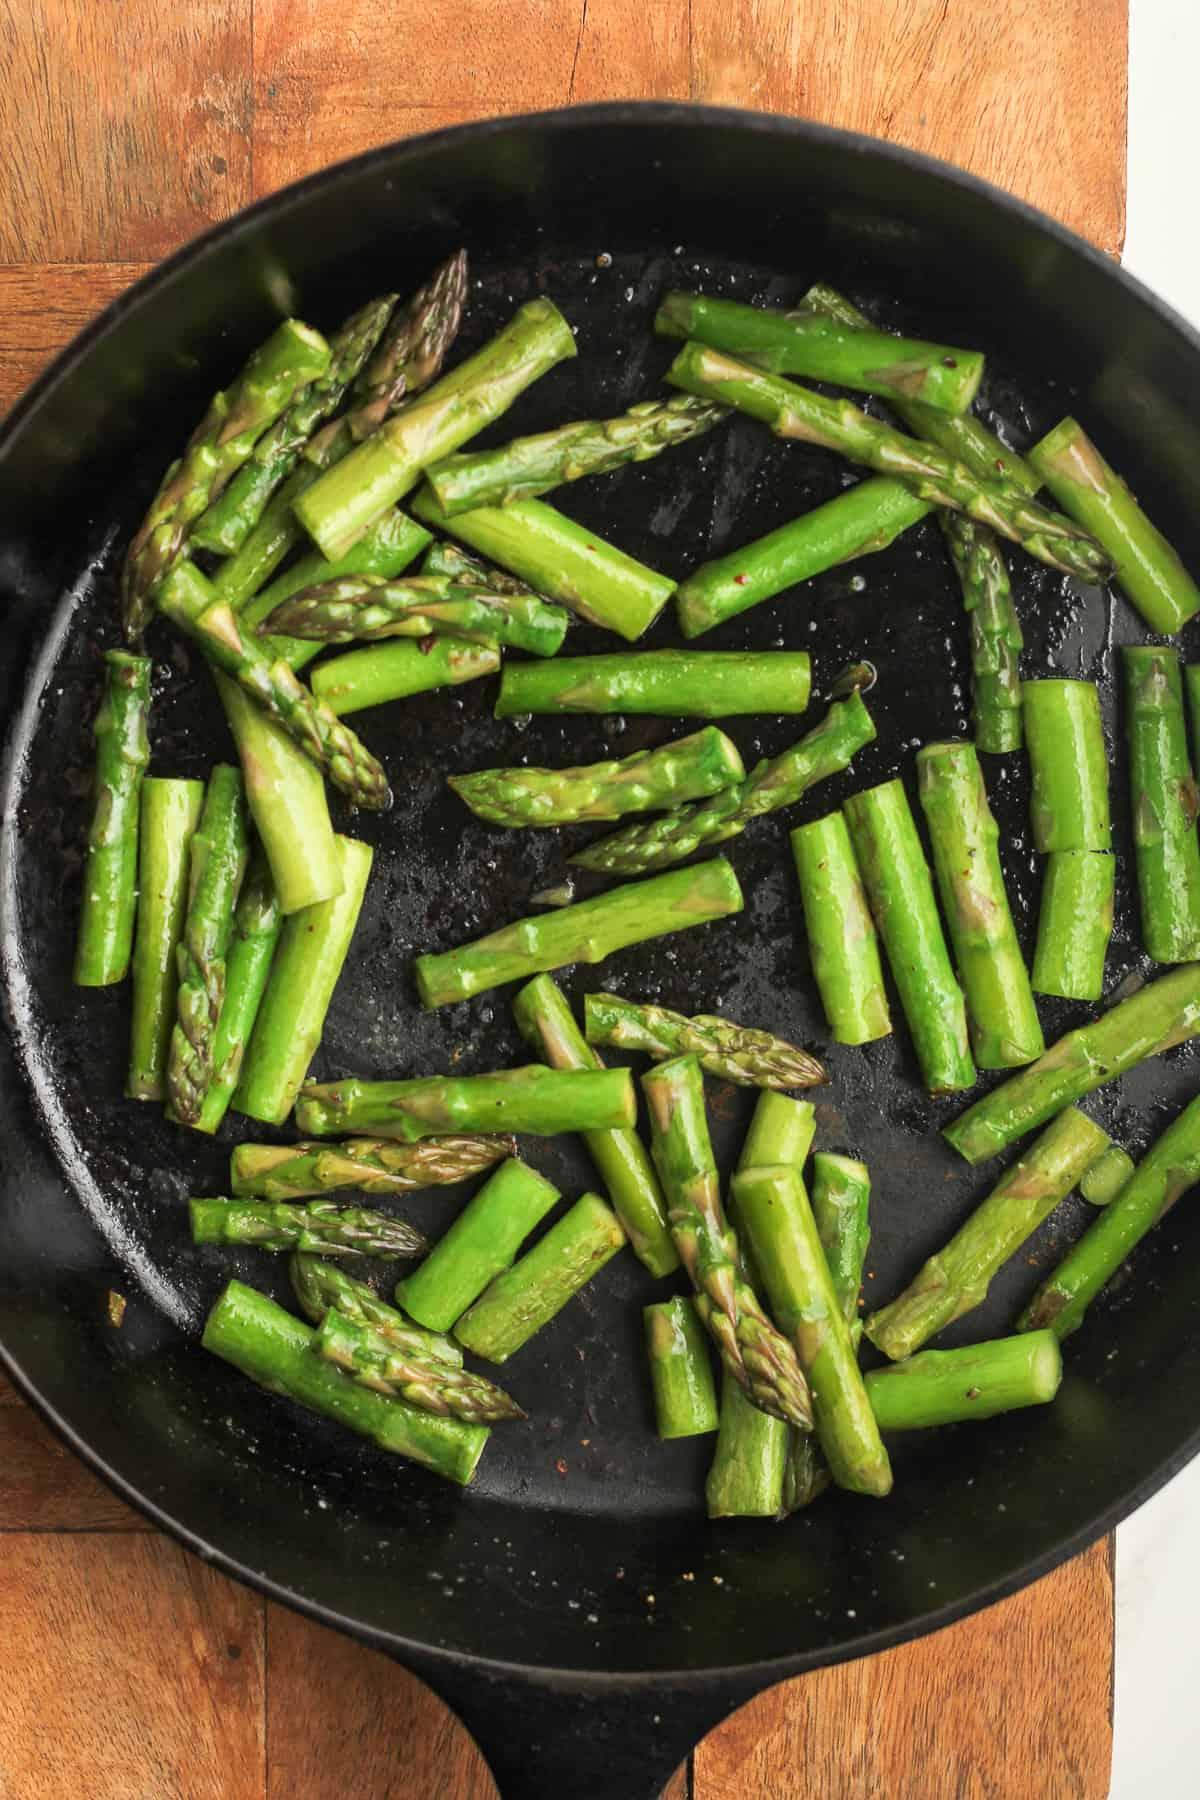 A skillet of asparagus.